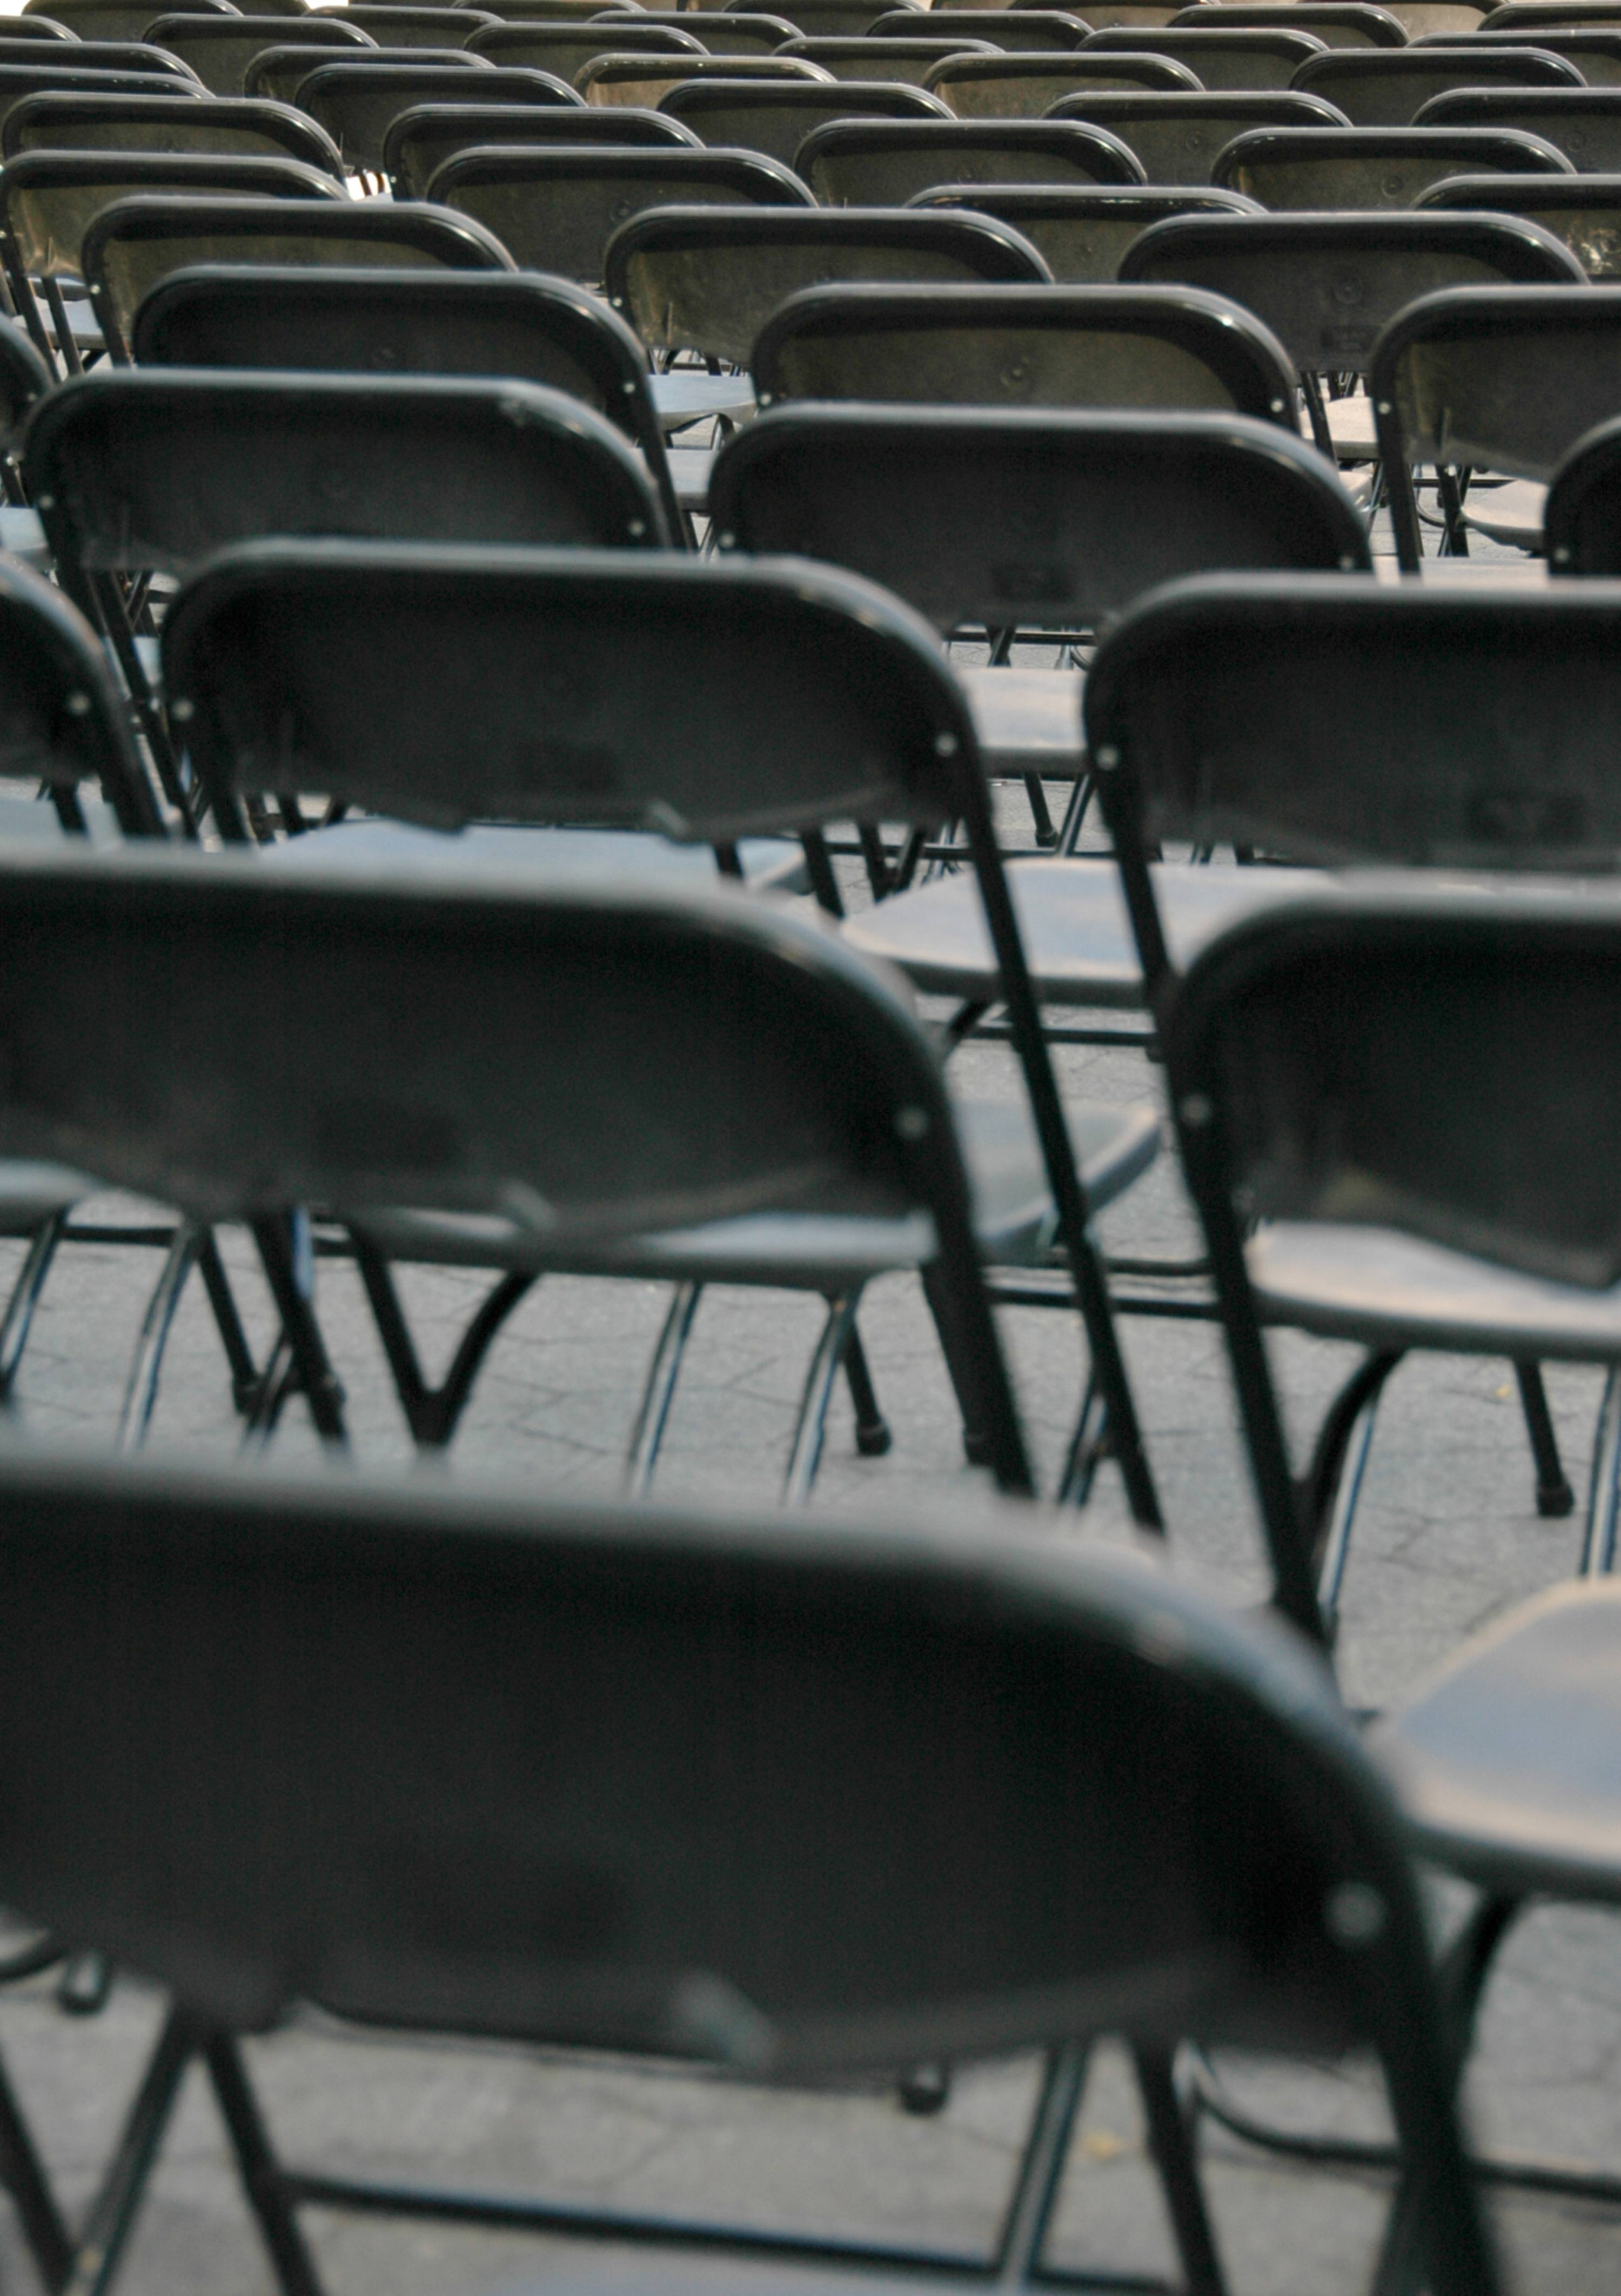 Pattern of Empty Black Folding Chairs